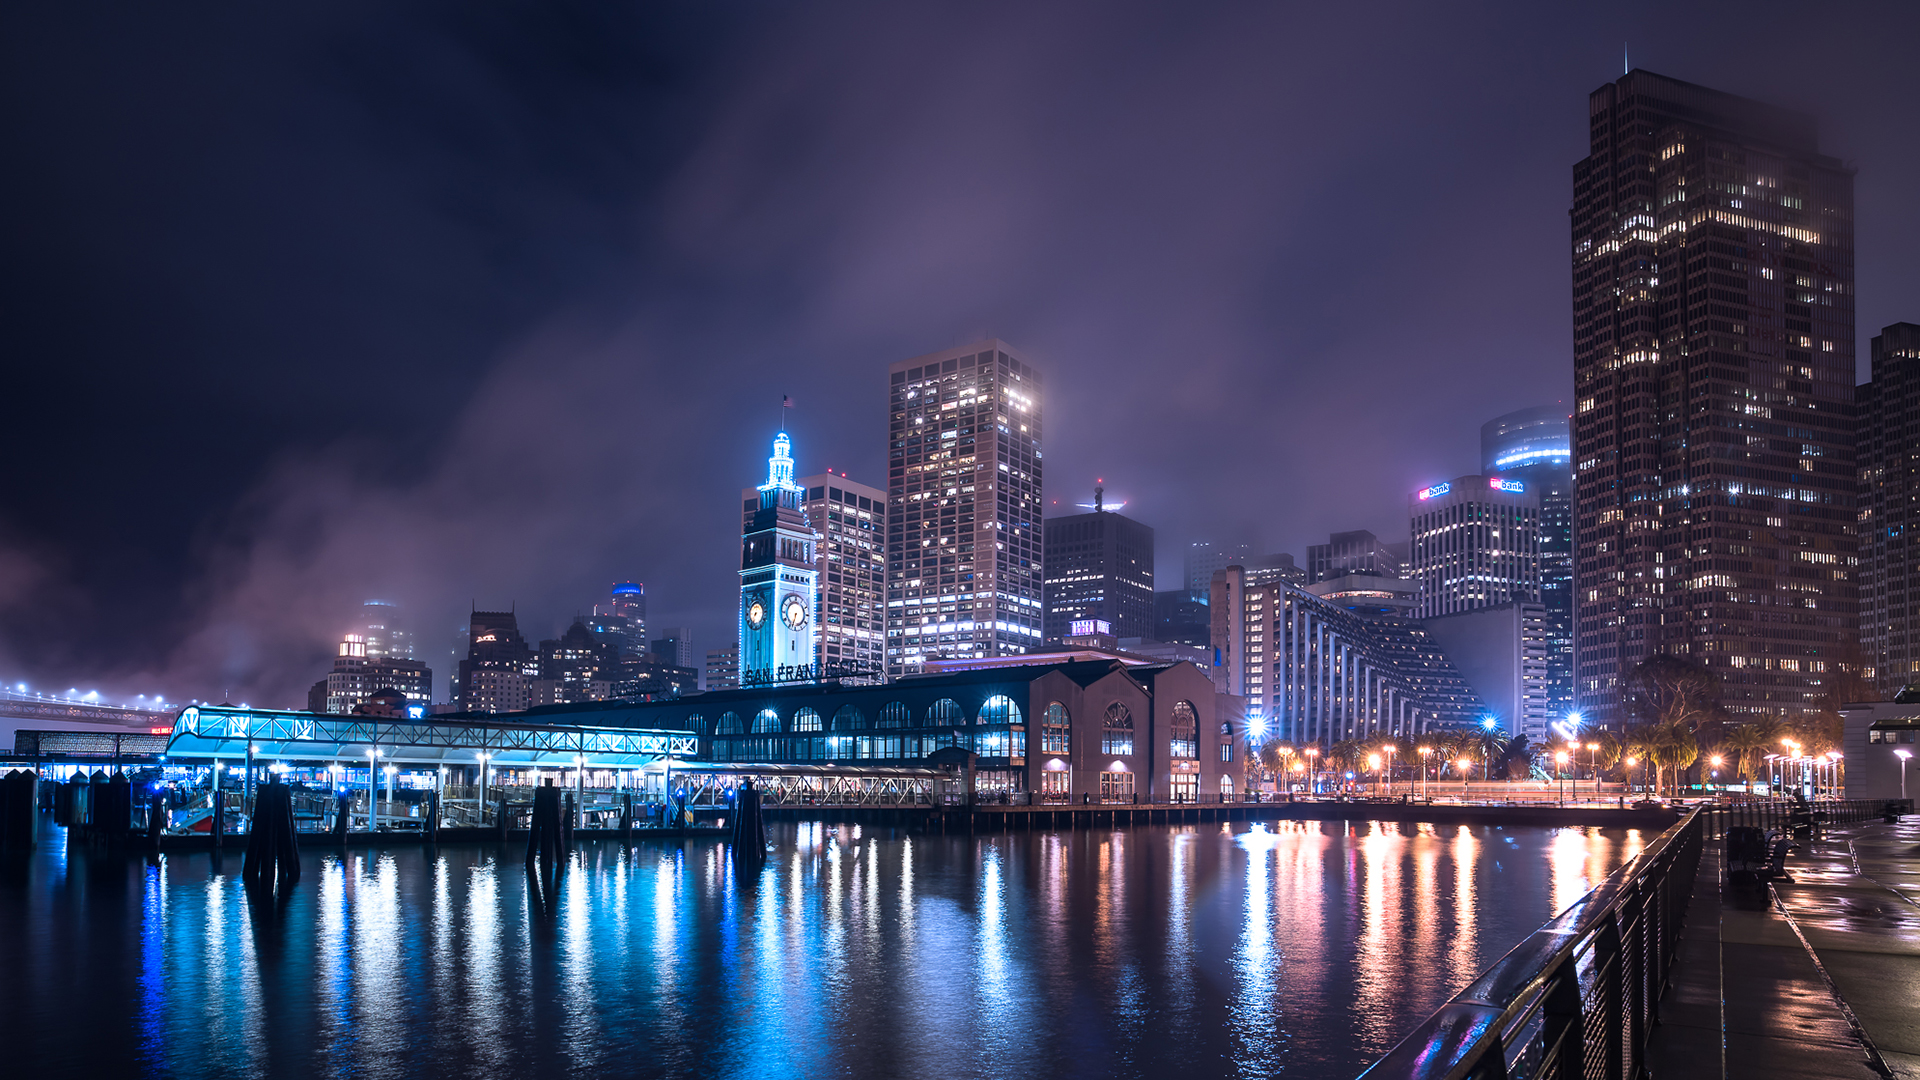 Fond d'ecran San Francisco by Night - Wallpaper